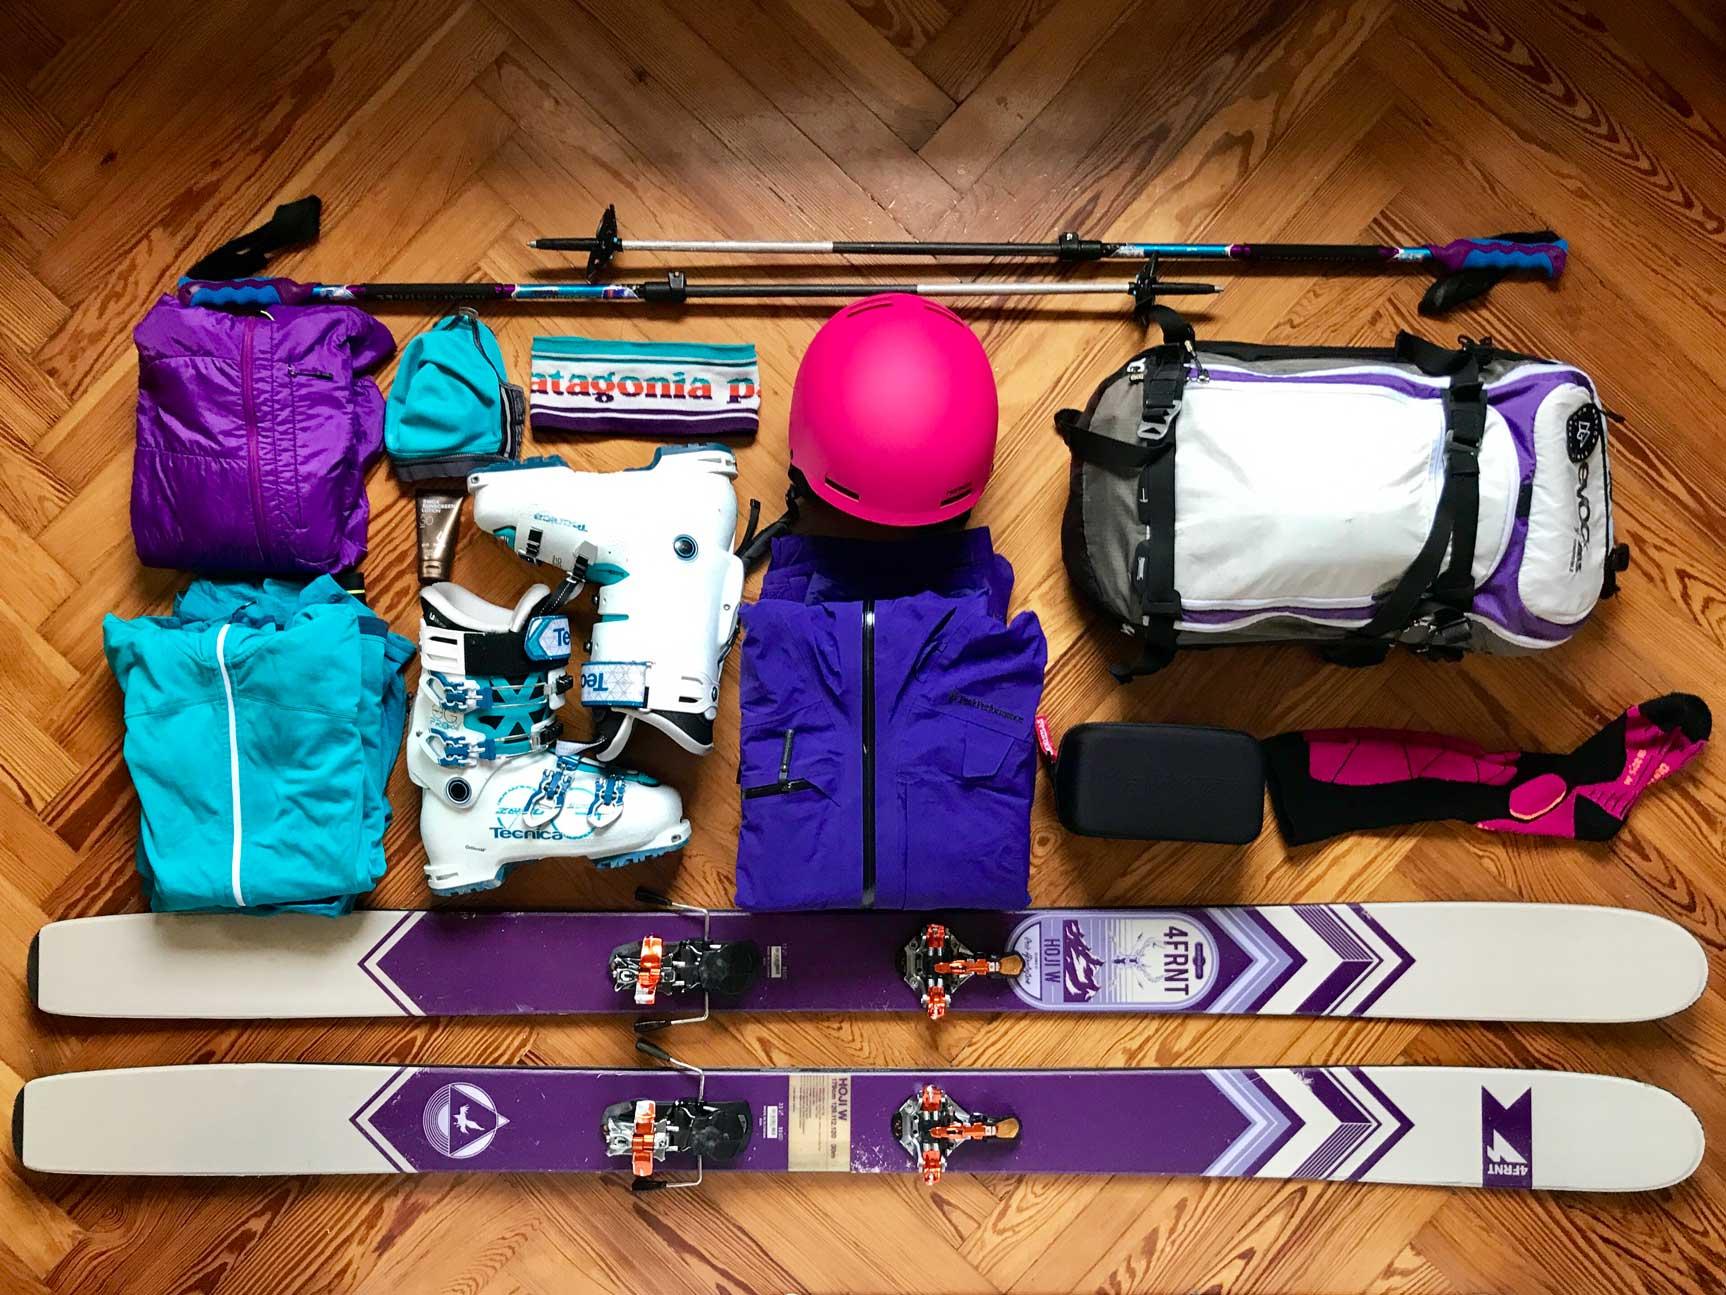 packliste-skifahren-munich-mountain-girls-katharina-kestler-legebild